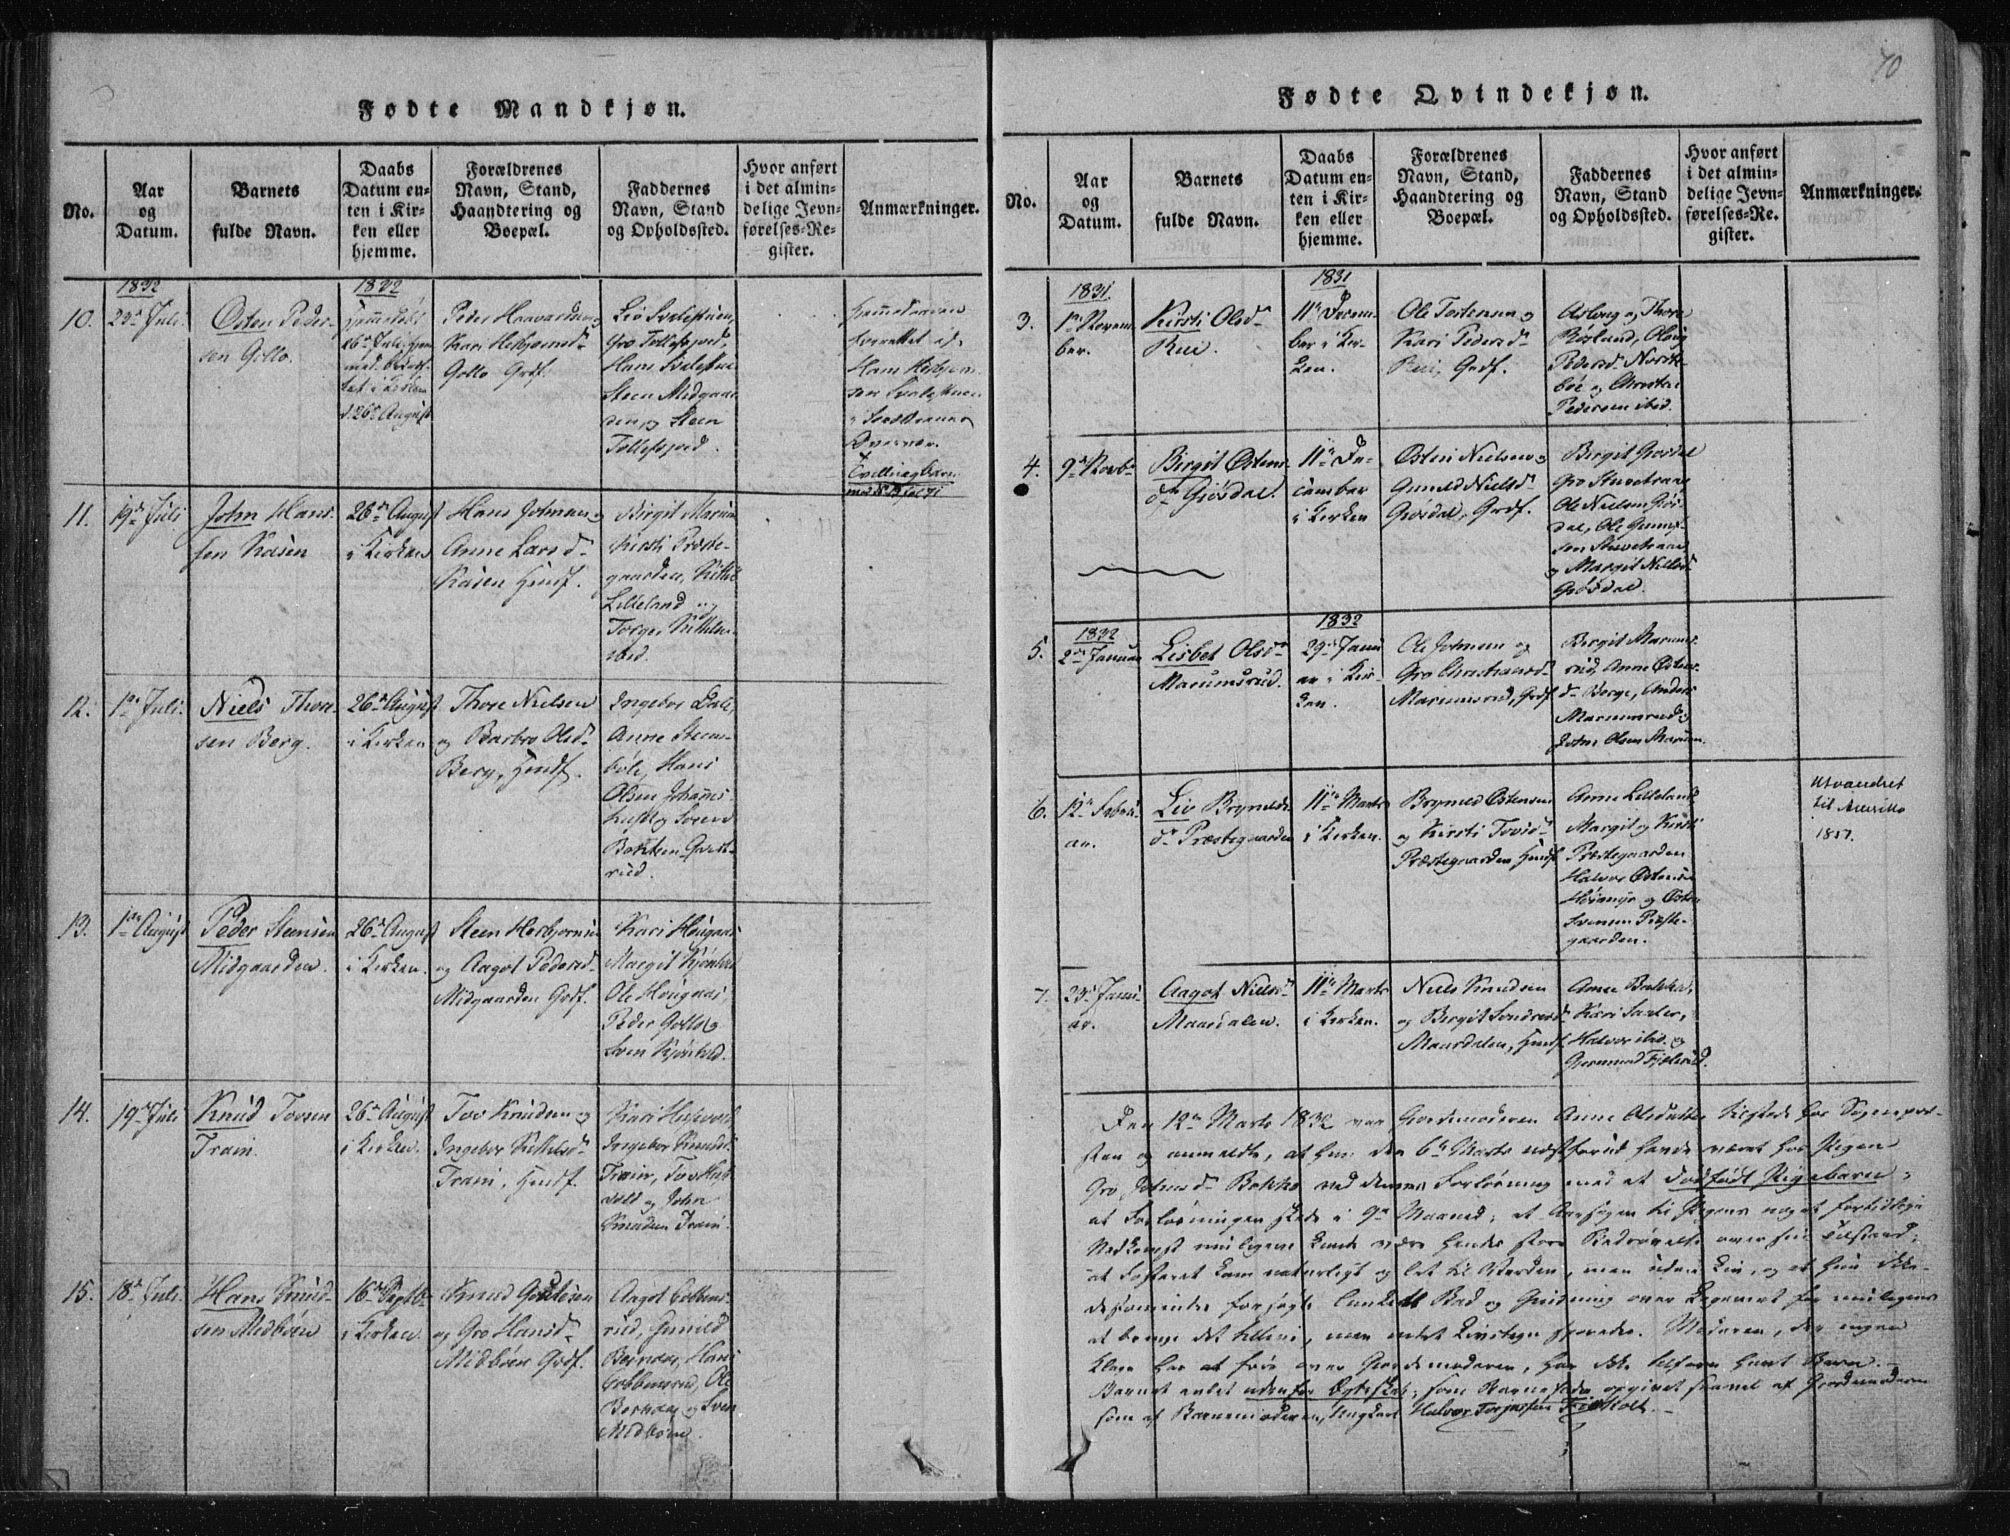 SAKO, Tinn kirkebøker, F/Fa/L0004: Ministerialbok nr. I 4, 1815-1843, s. 70